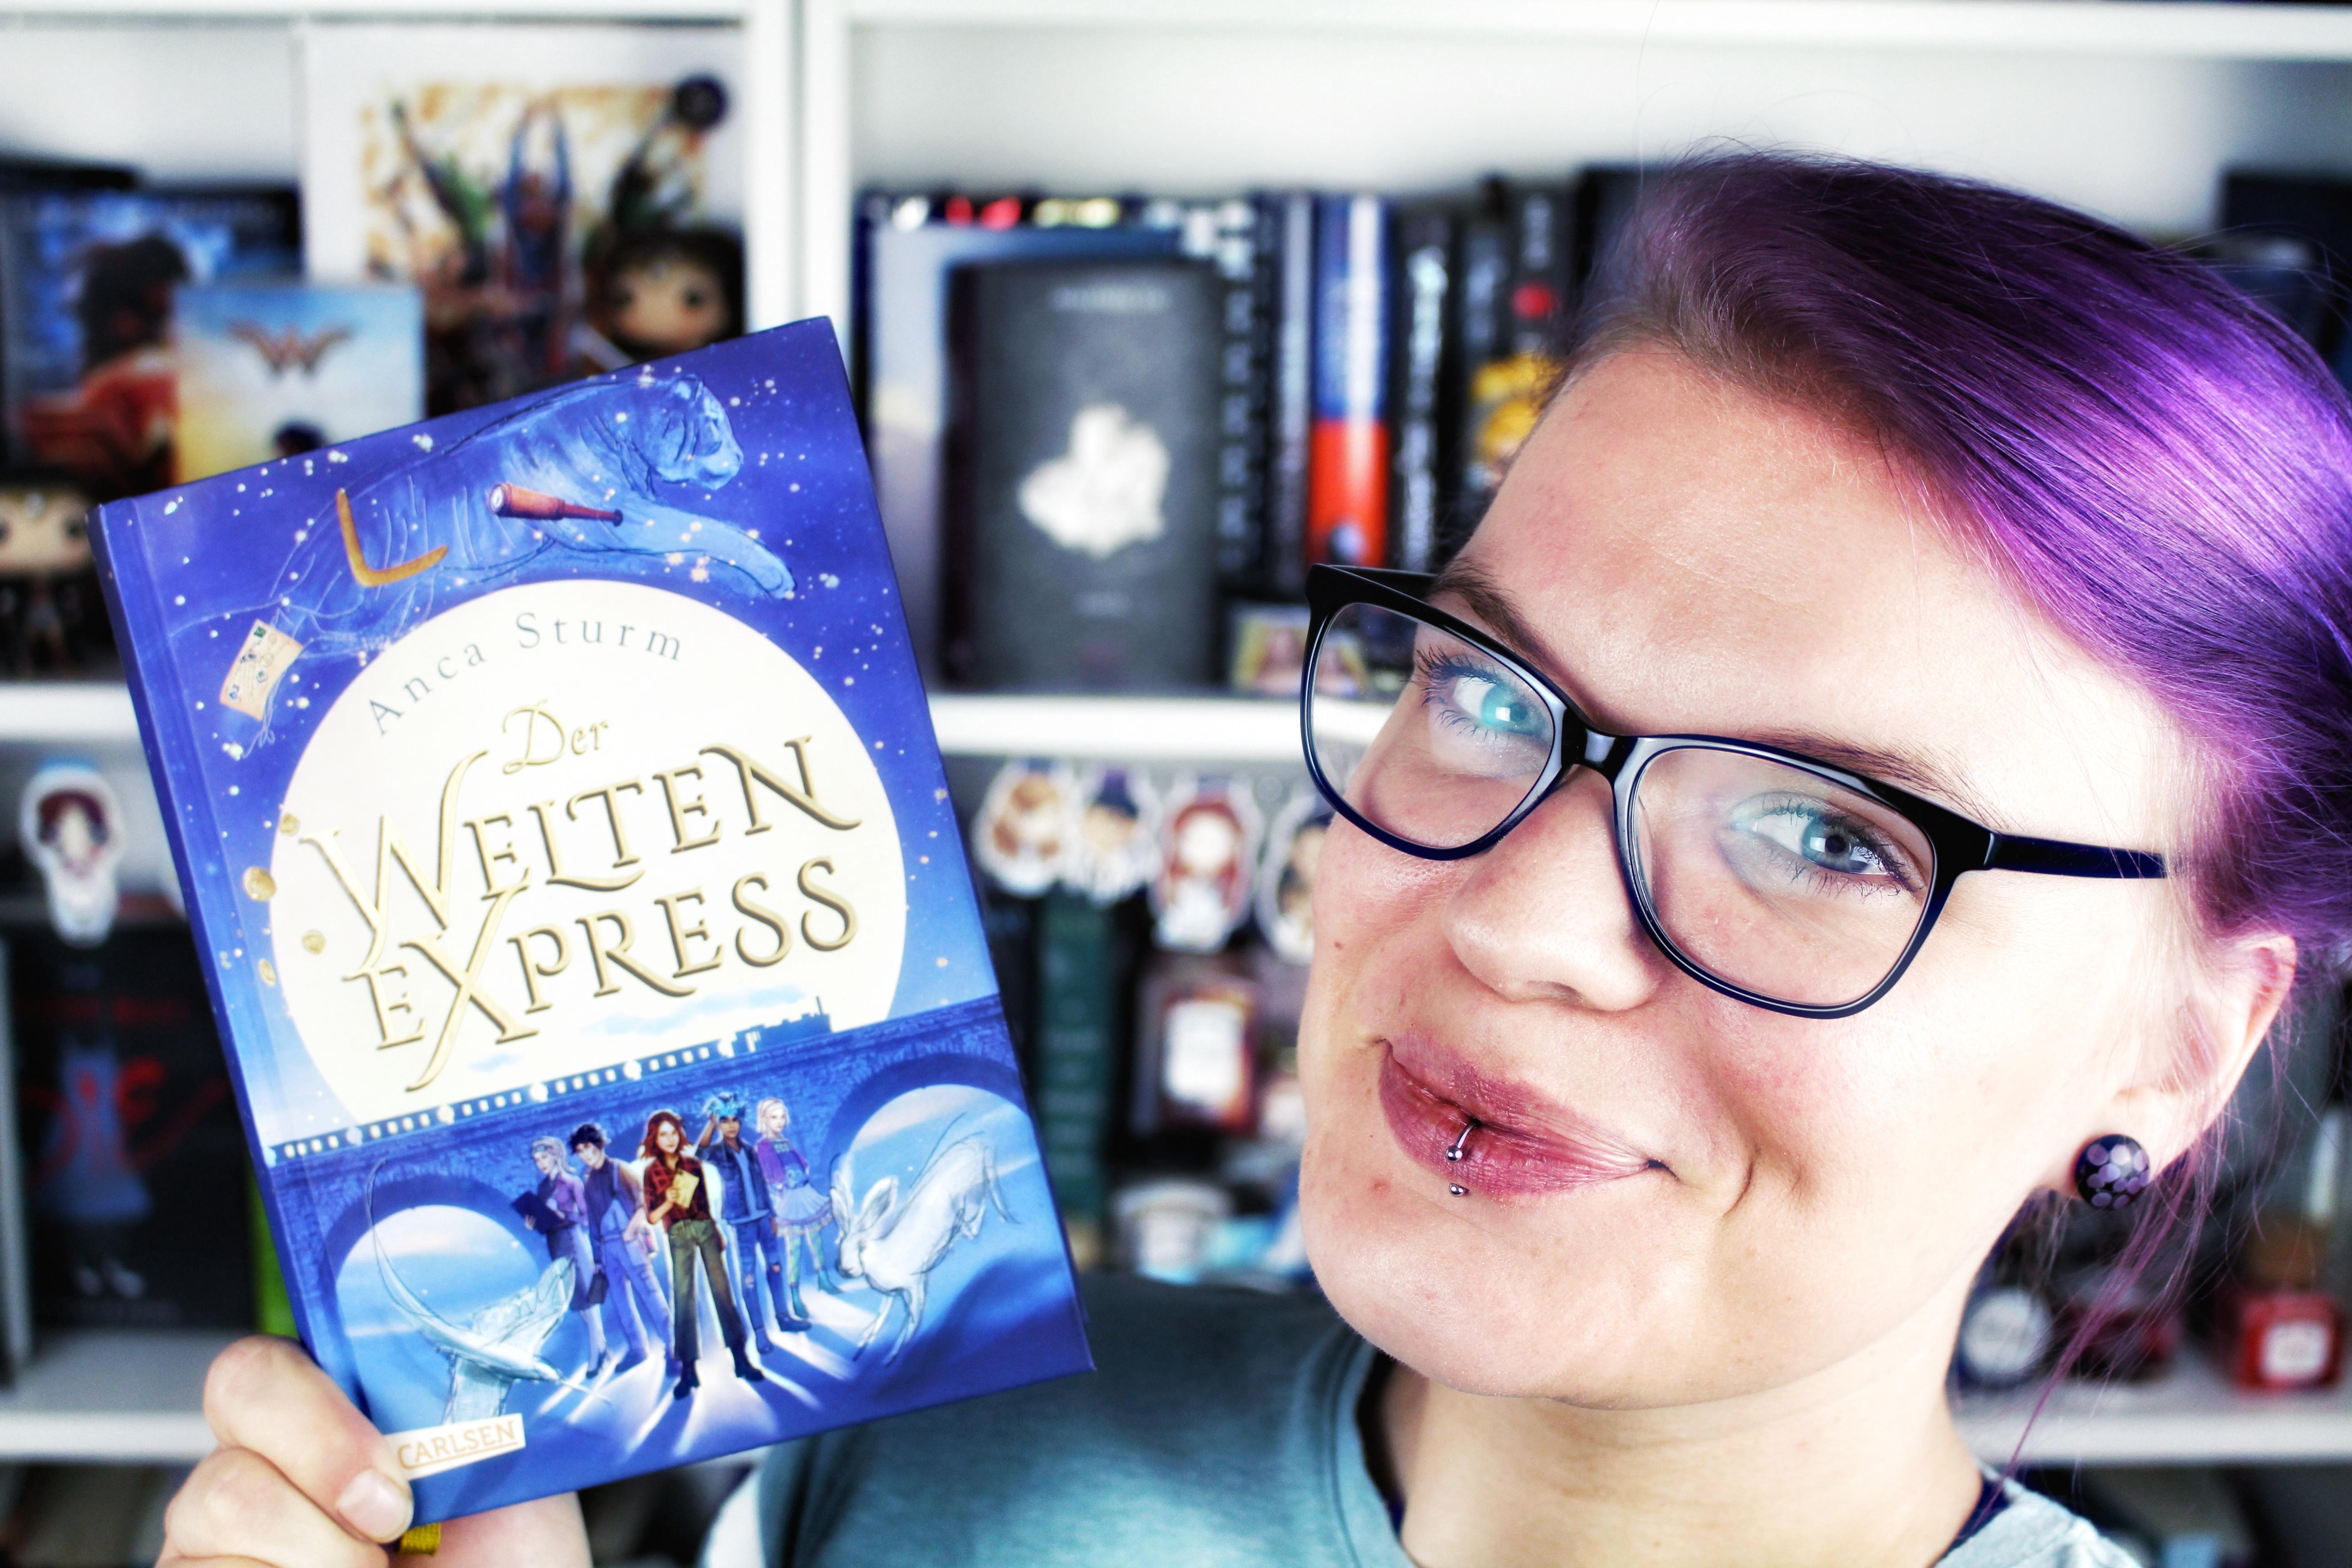 Rezension: Der Welten-Express / Anca Sturm